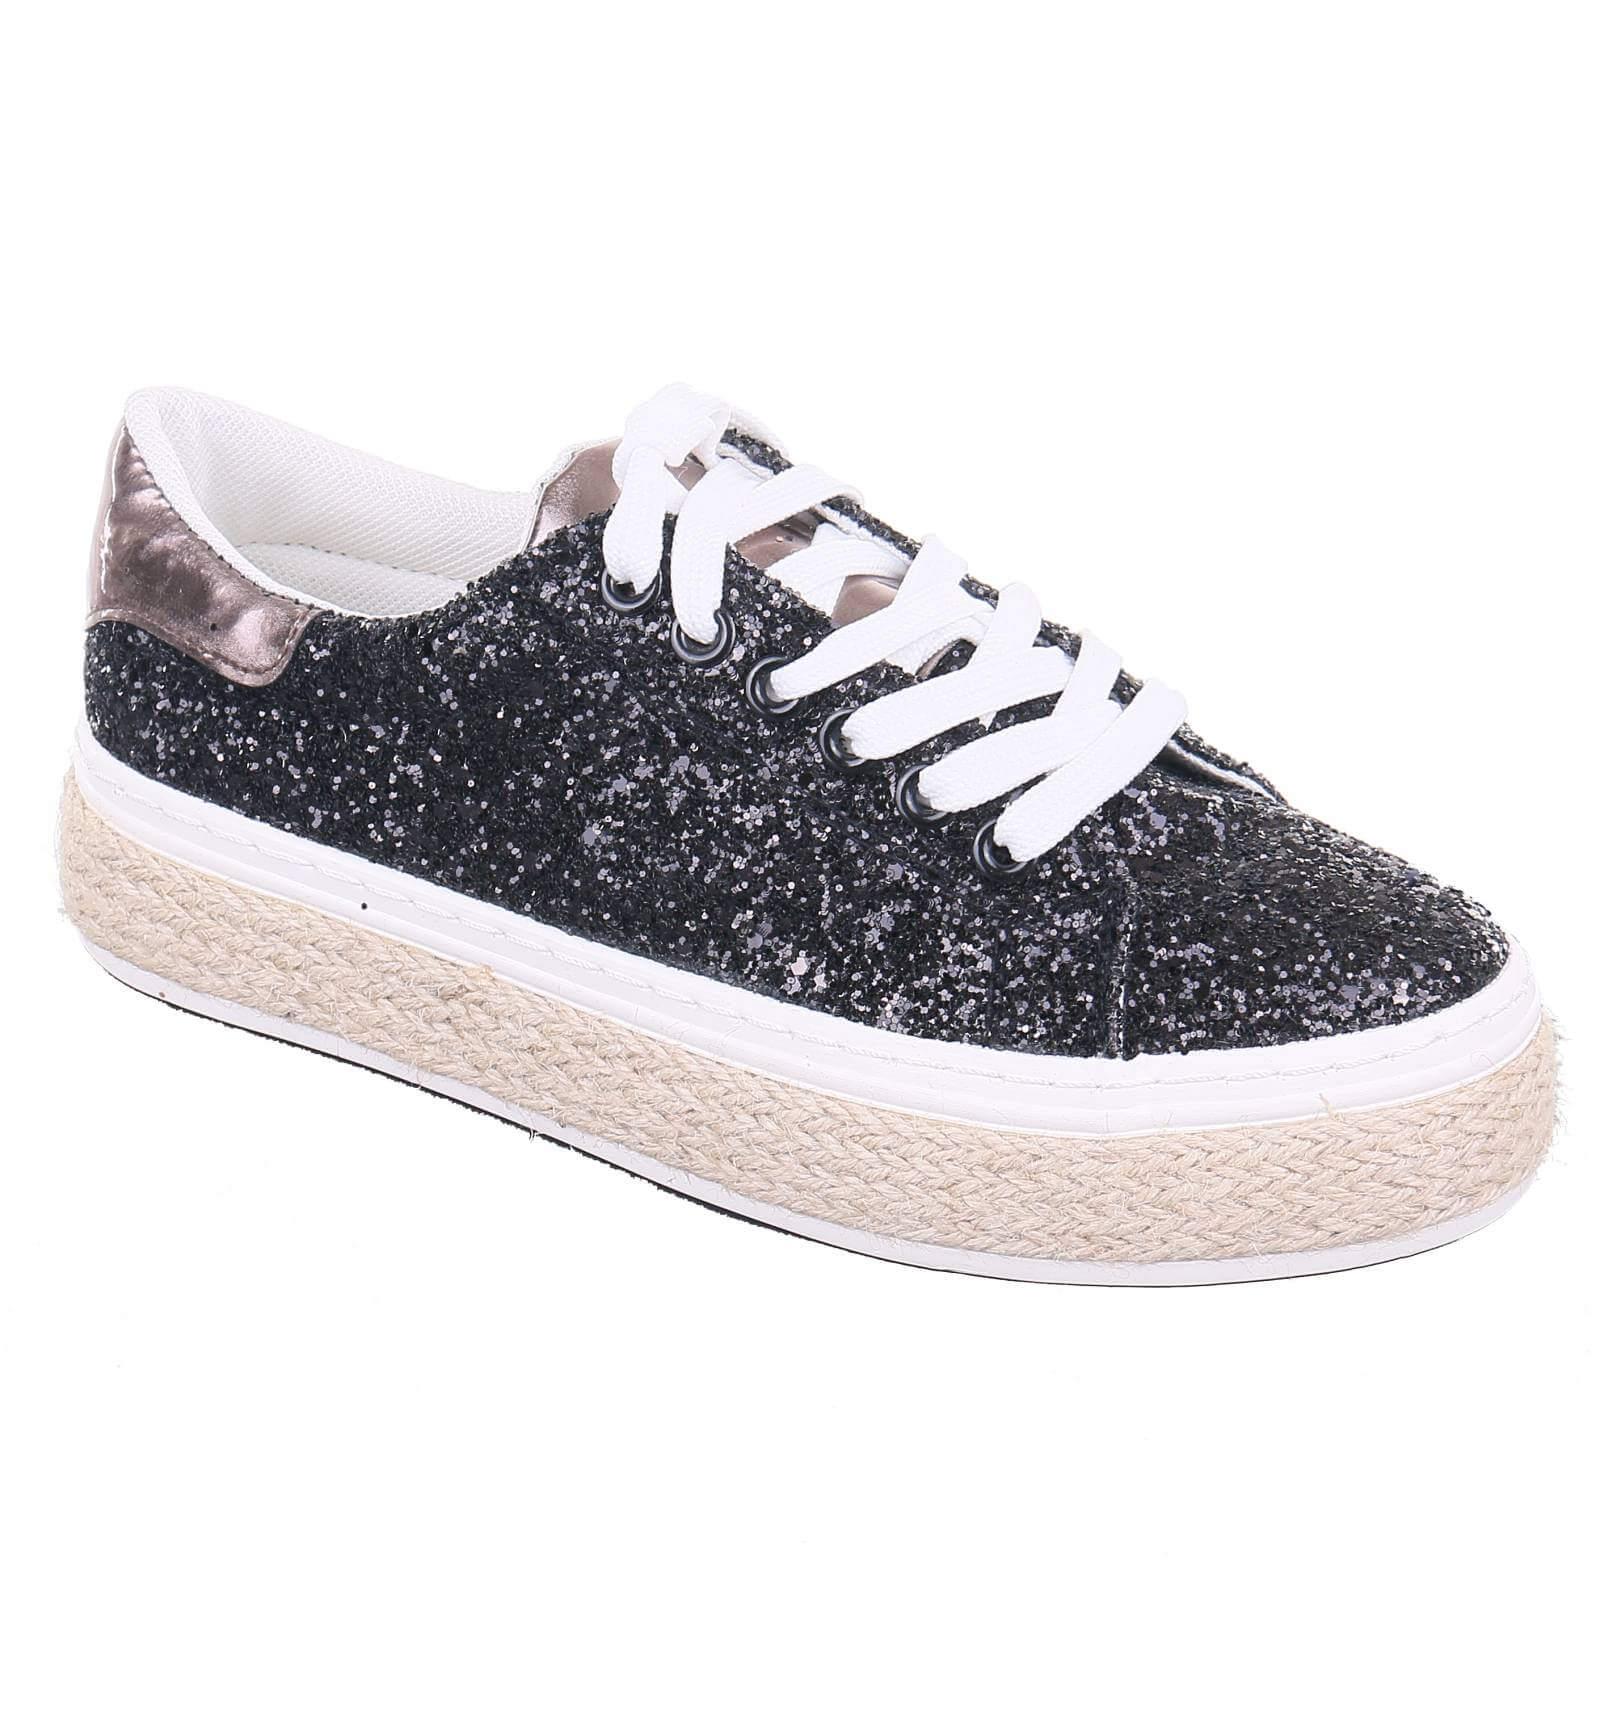 f336d60c373aaa Chaussure femme compensée simili cuir avec strass de fantaisie noir ...